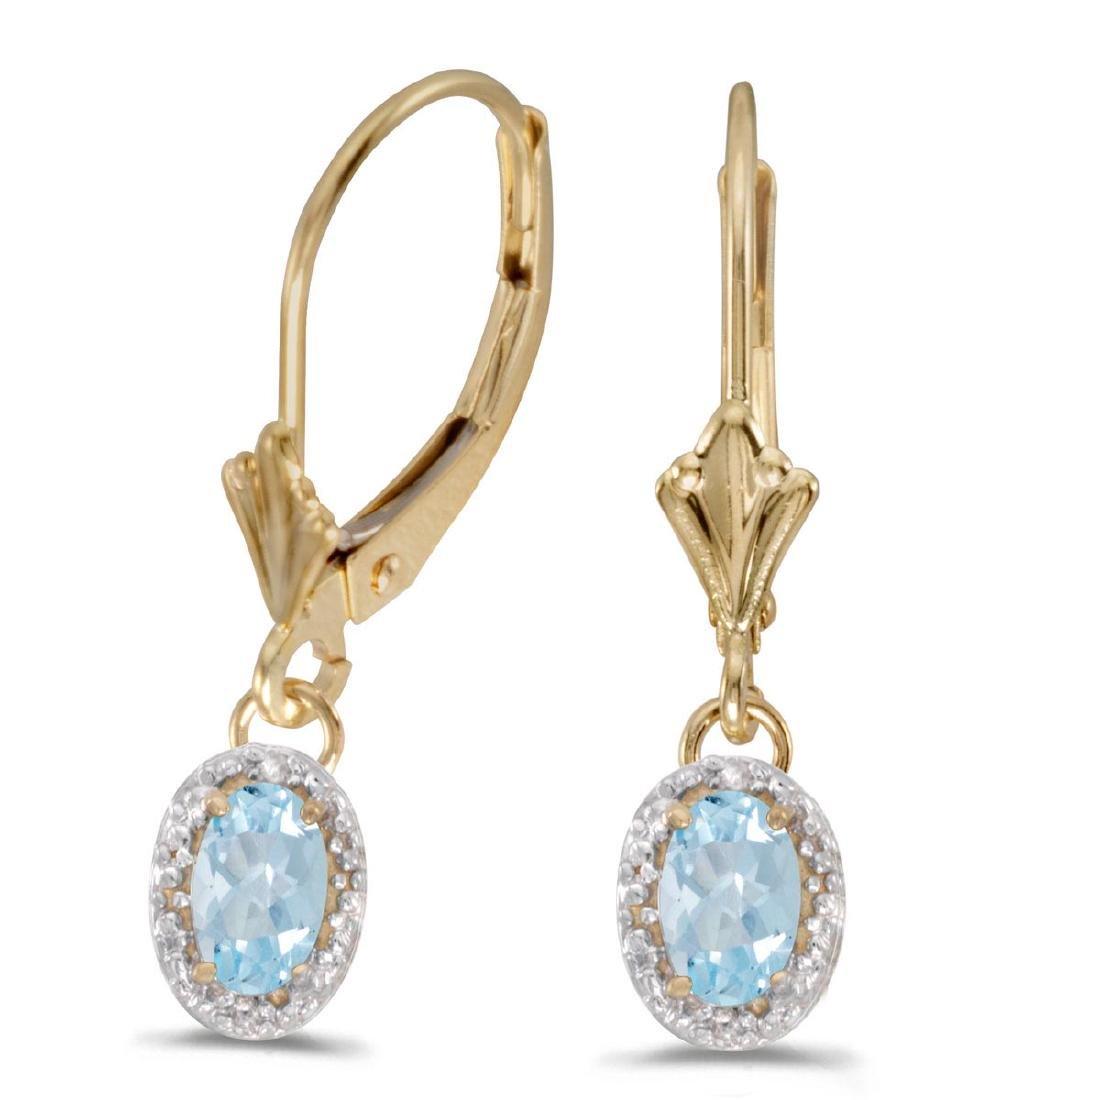 Certified 14k Yellow Gold Oval Aquamarine And Diamond L